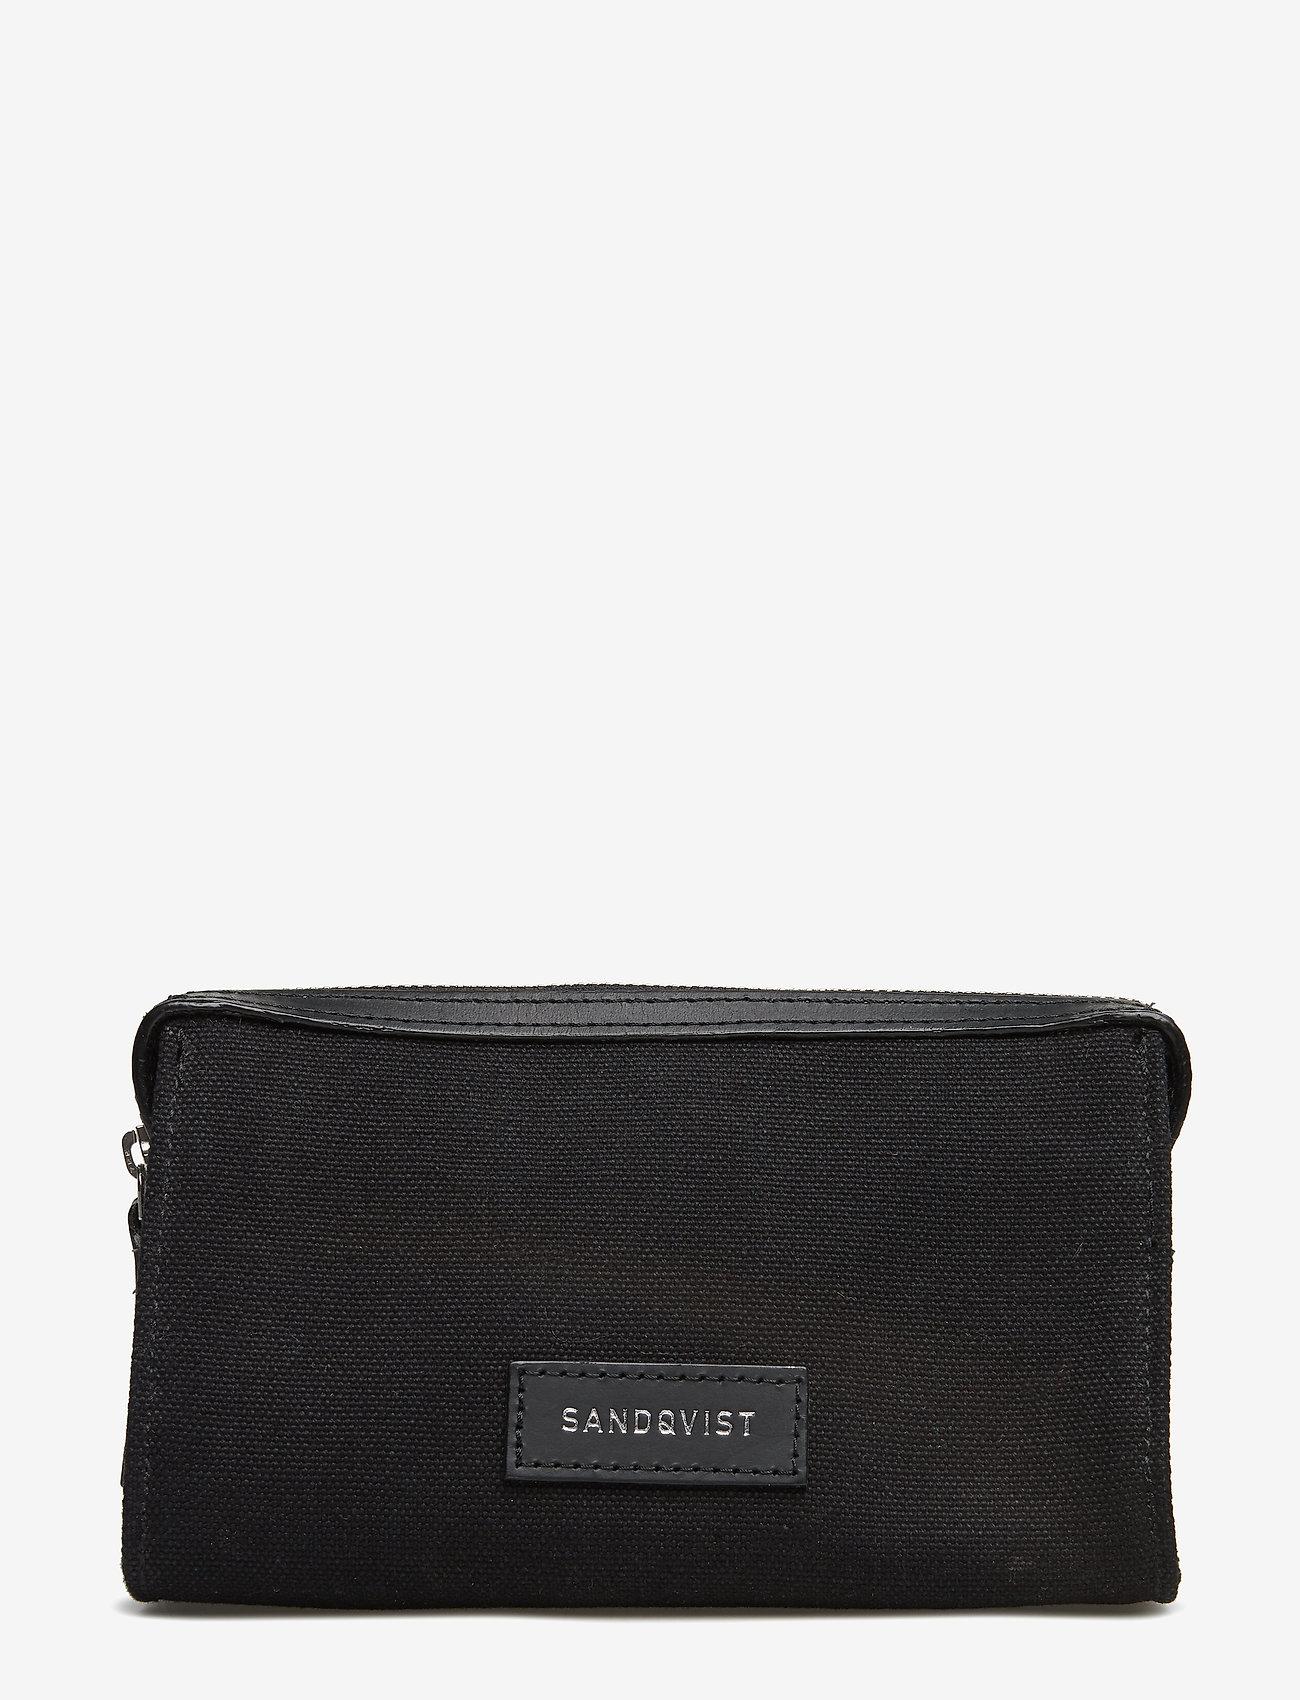 SANDQVIST - INA - toiletry bags - black